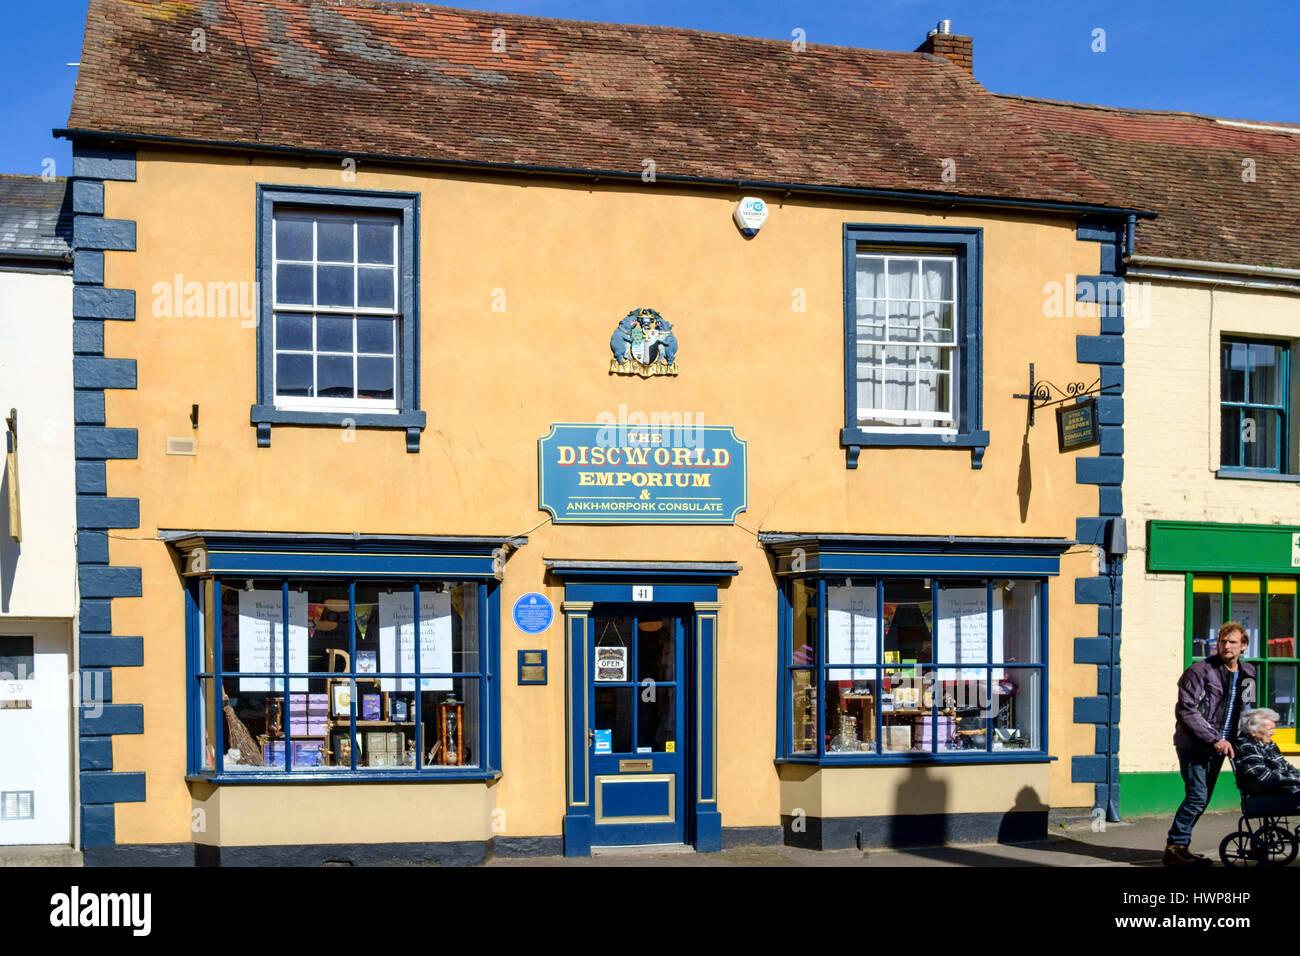 Views of Wincanton Town in somerset England UK. Cunning Artificer Discworld Shop - Stock Image